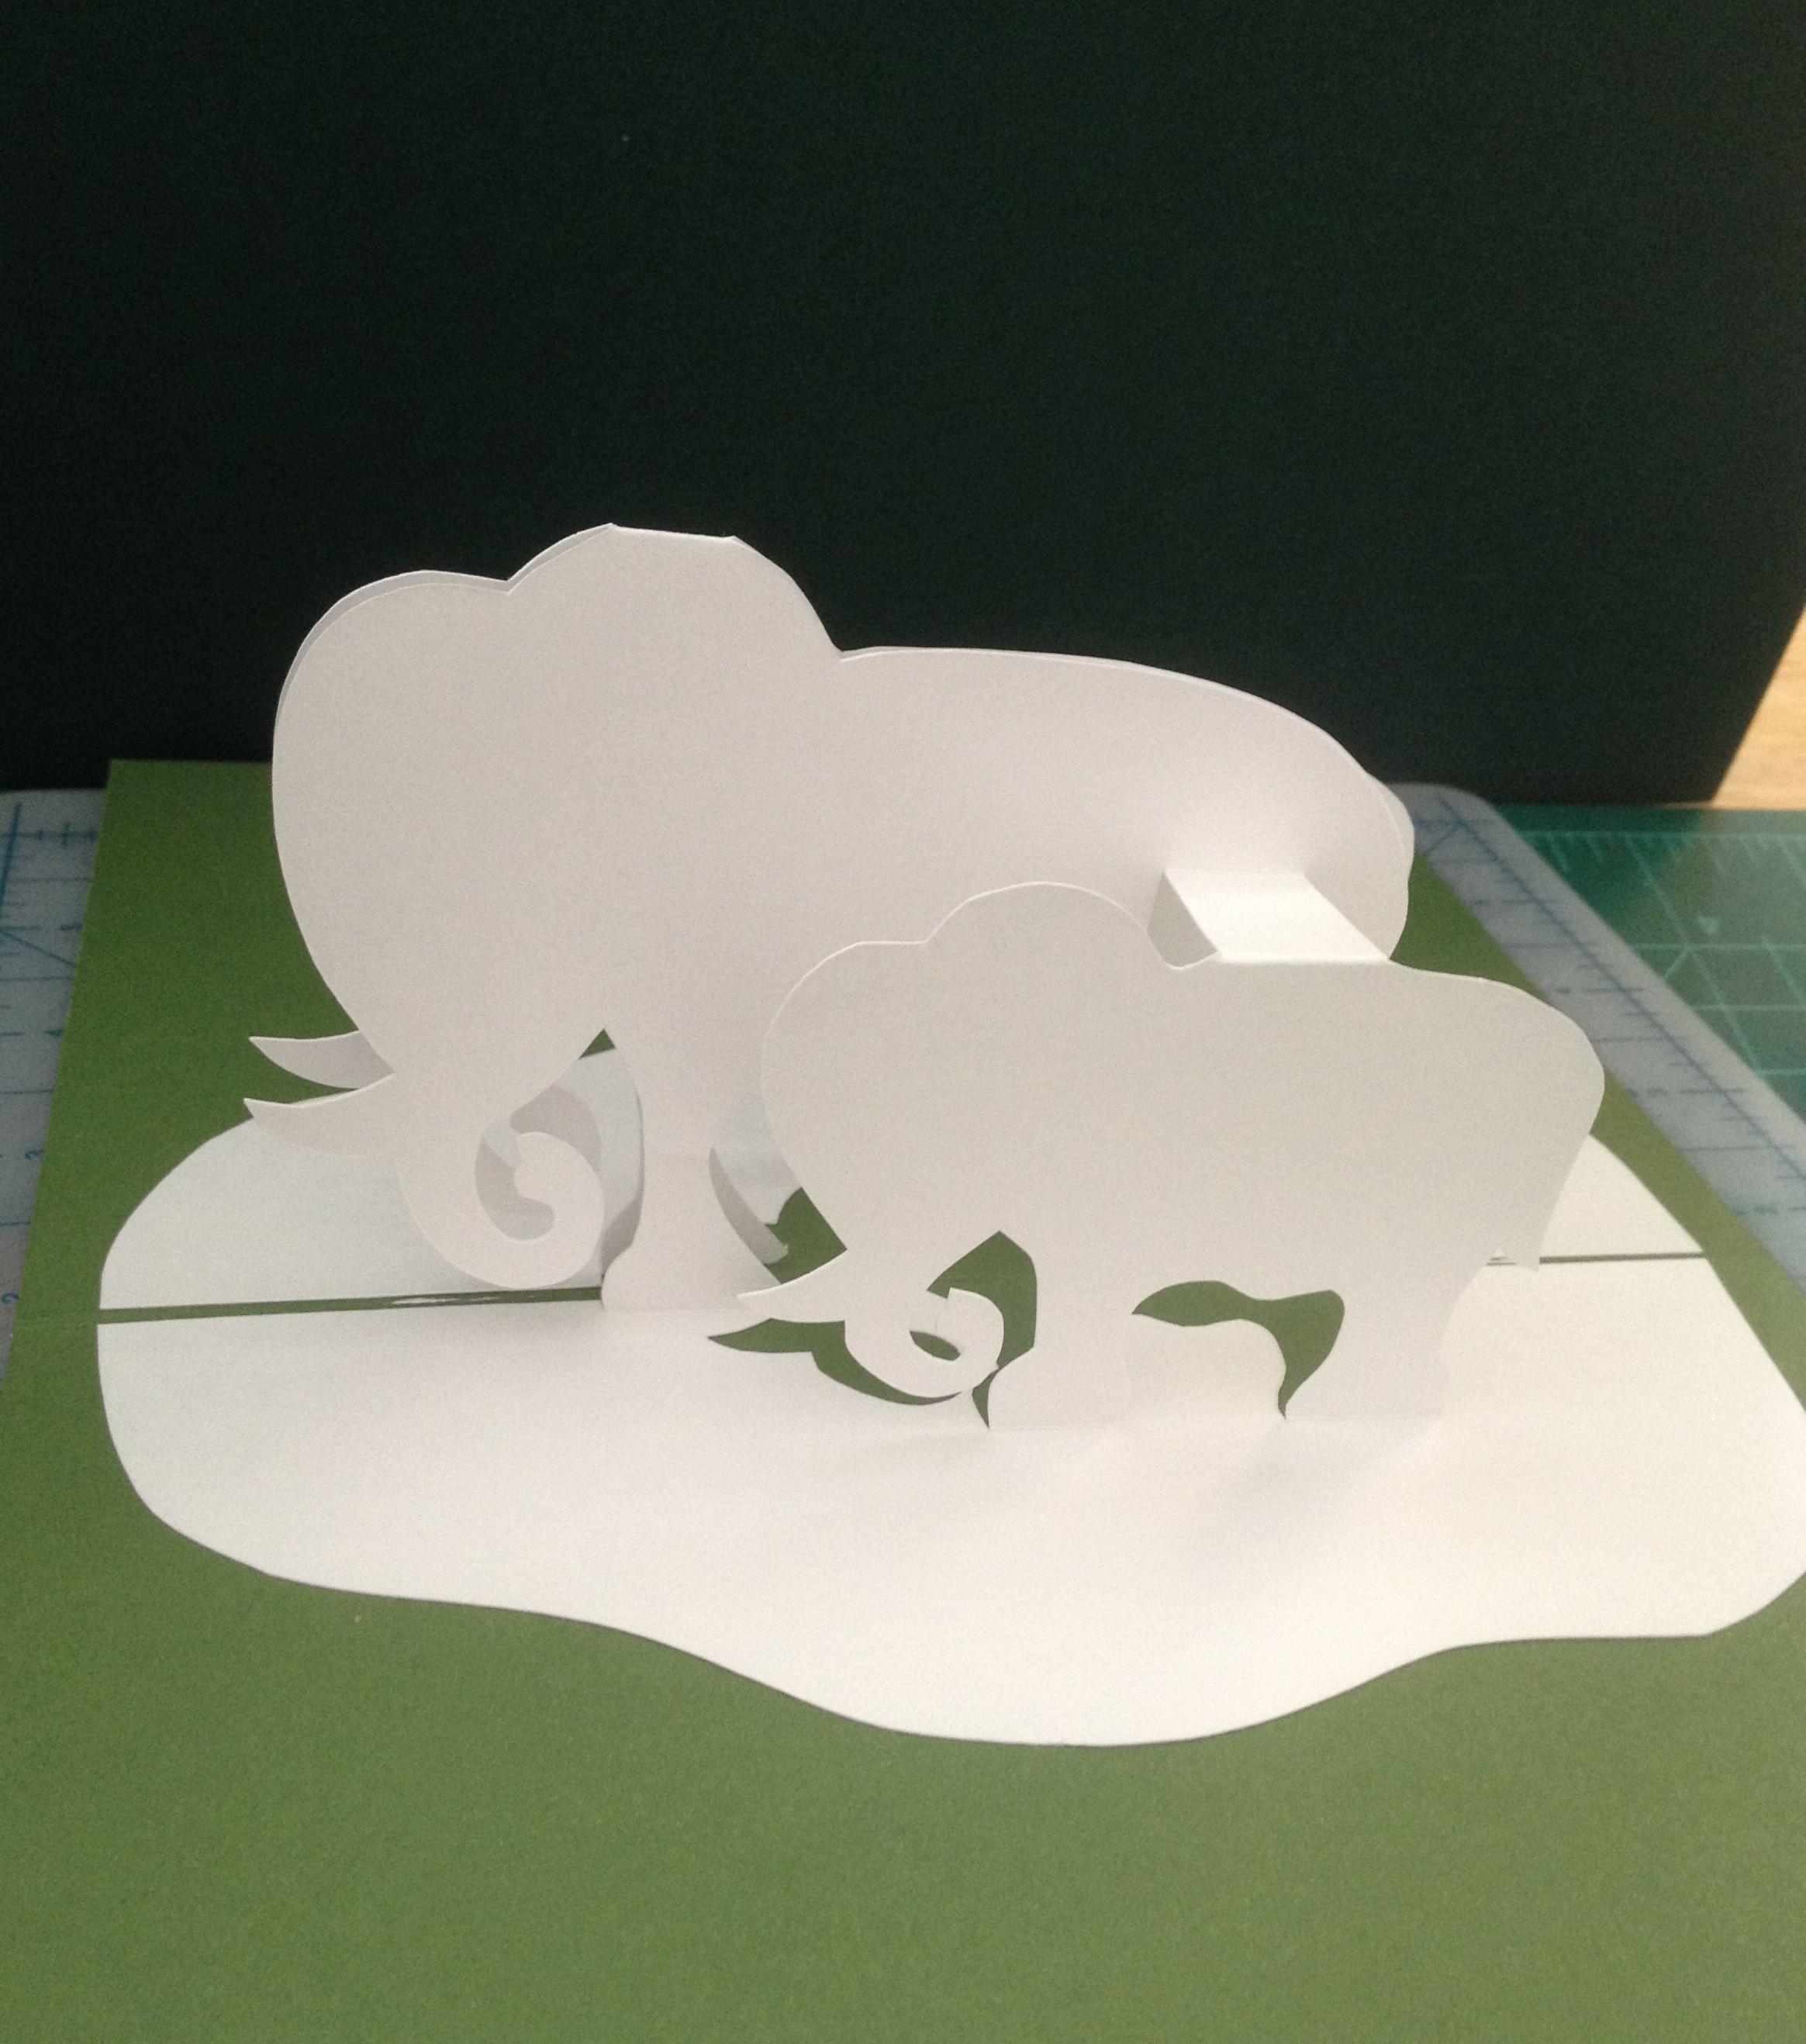 Elephants Pop Up Card Pop Up Card Templates Pop Up Cards Paper Pop